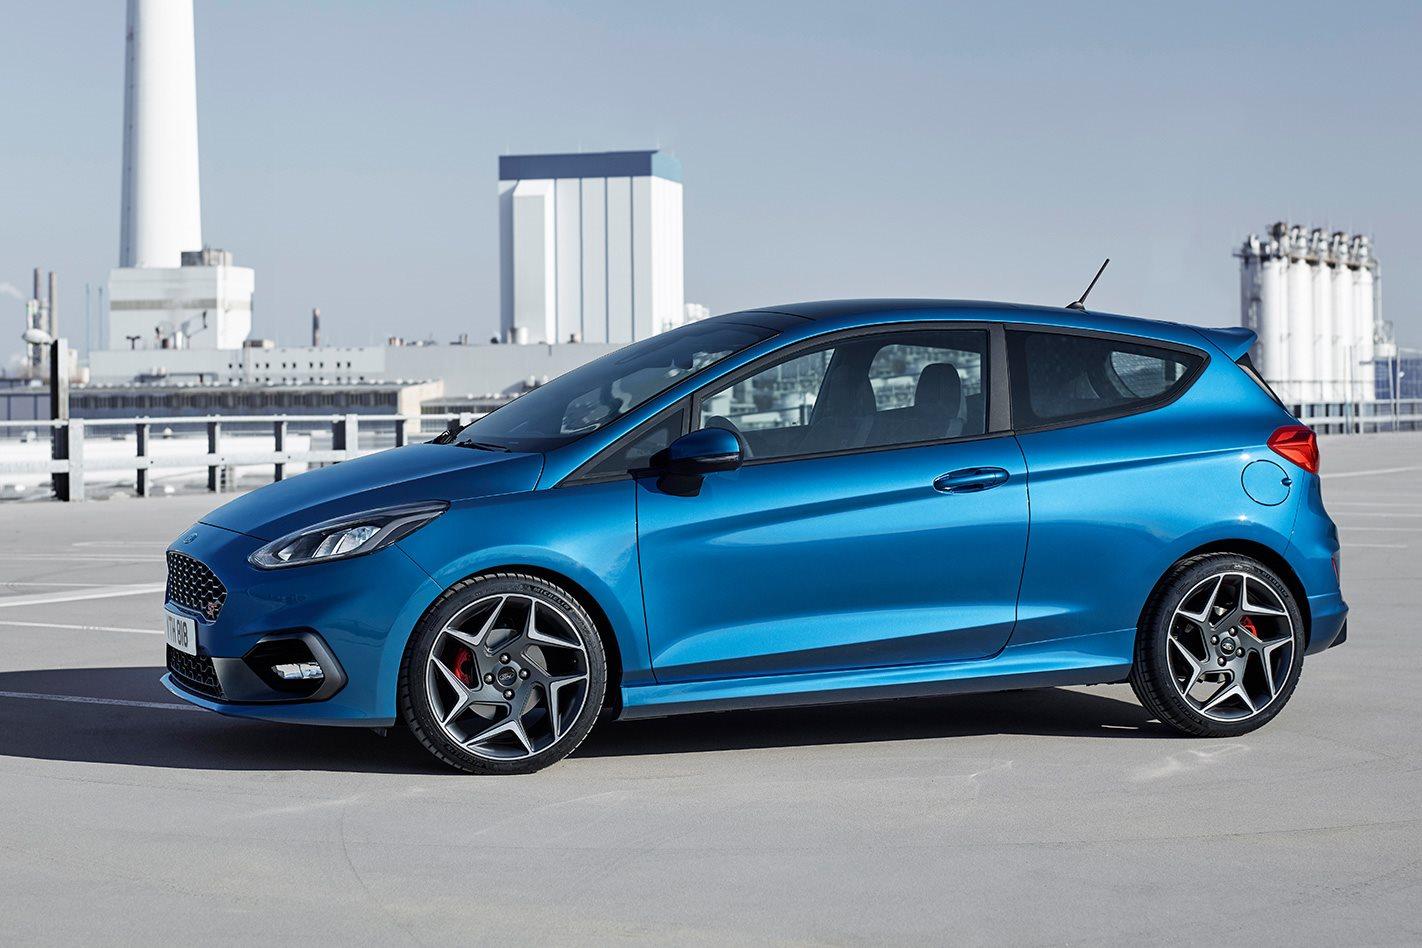 2019 ford fiesta st confirmed for australia - Garage volkswagen saint cloud ...